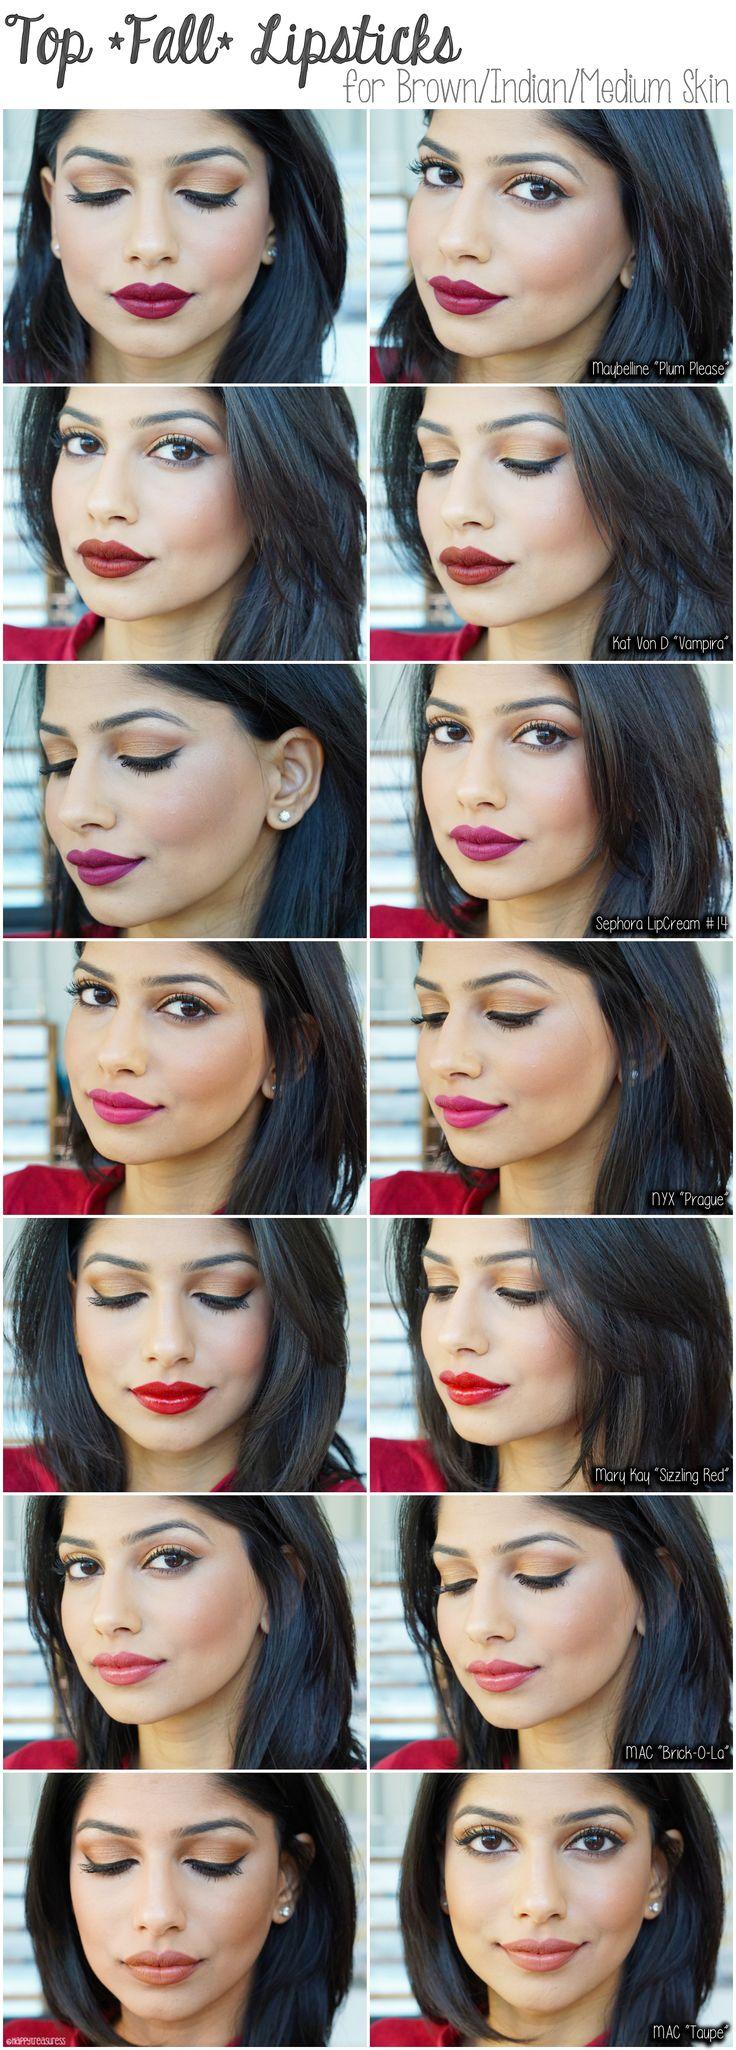 fall lipsticks for brown/medium/indian skin. favorite fall lipsticks for indian skin. MAC Taupe lipstick, MAC Brick O La, Kat von D Vampira